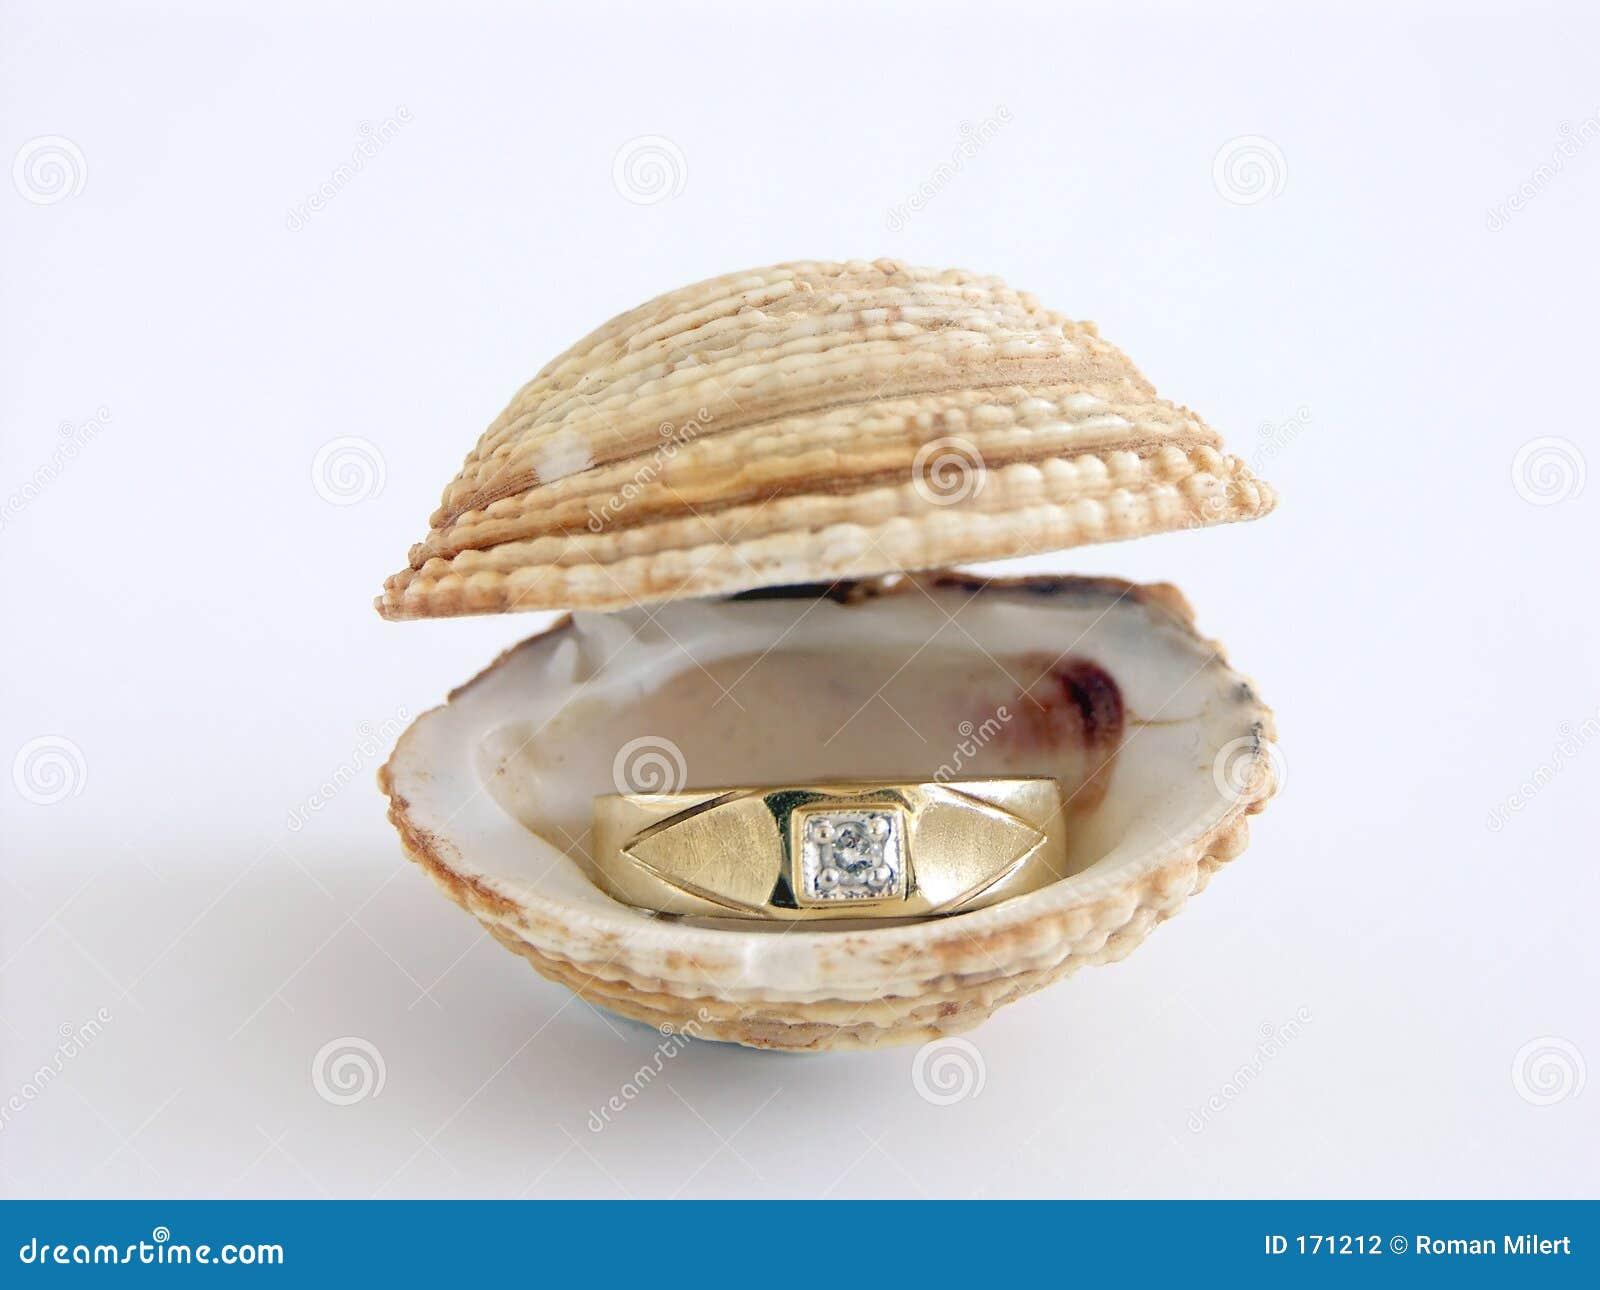 Ocean gift